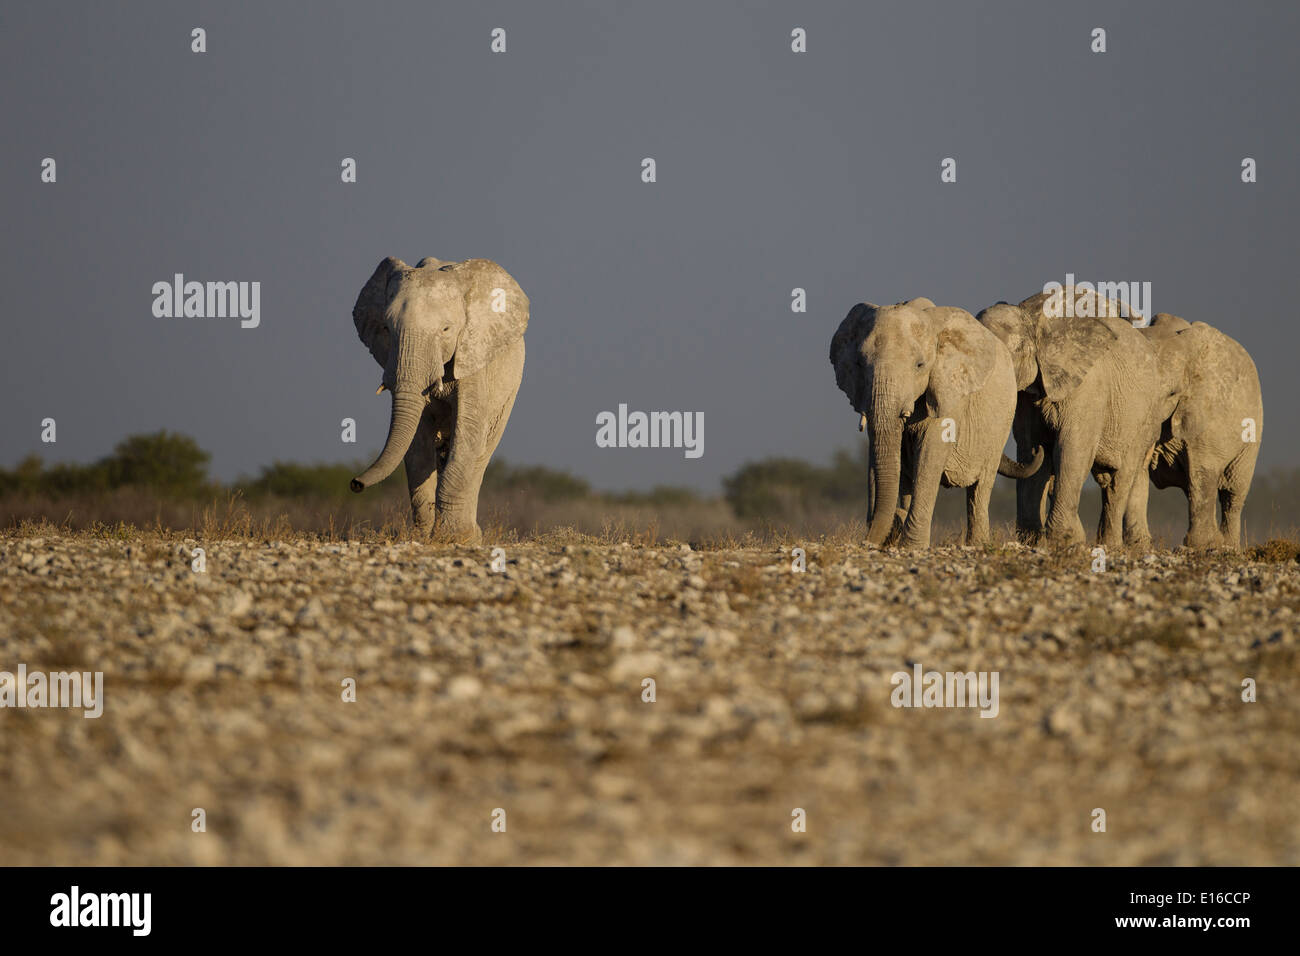 Elephants in Namibia Stock Photo